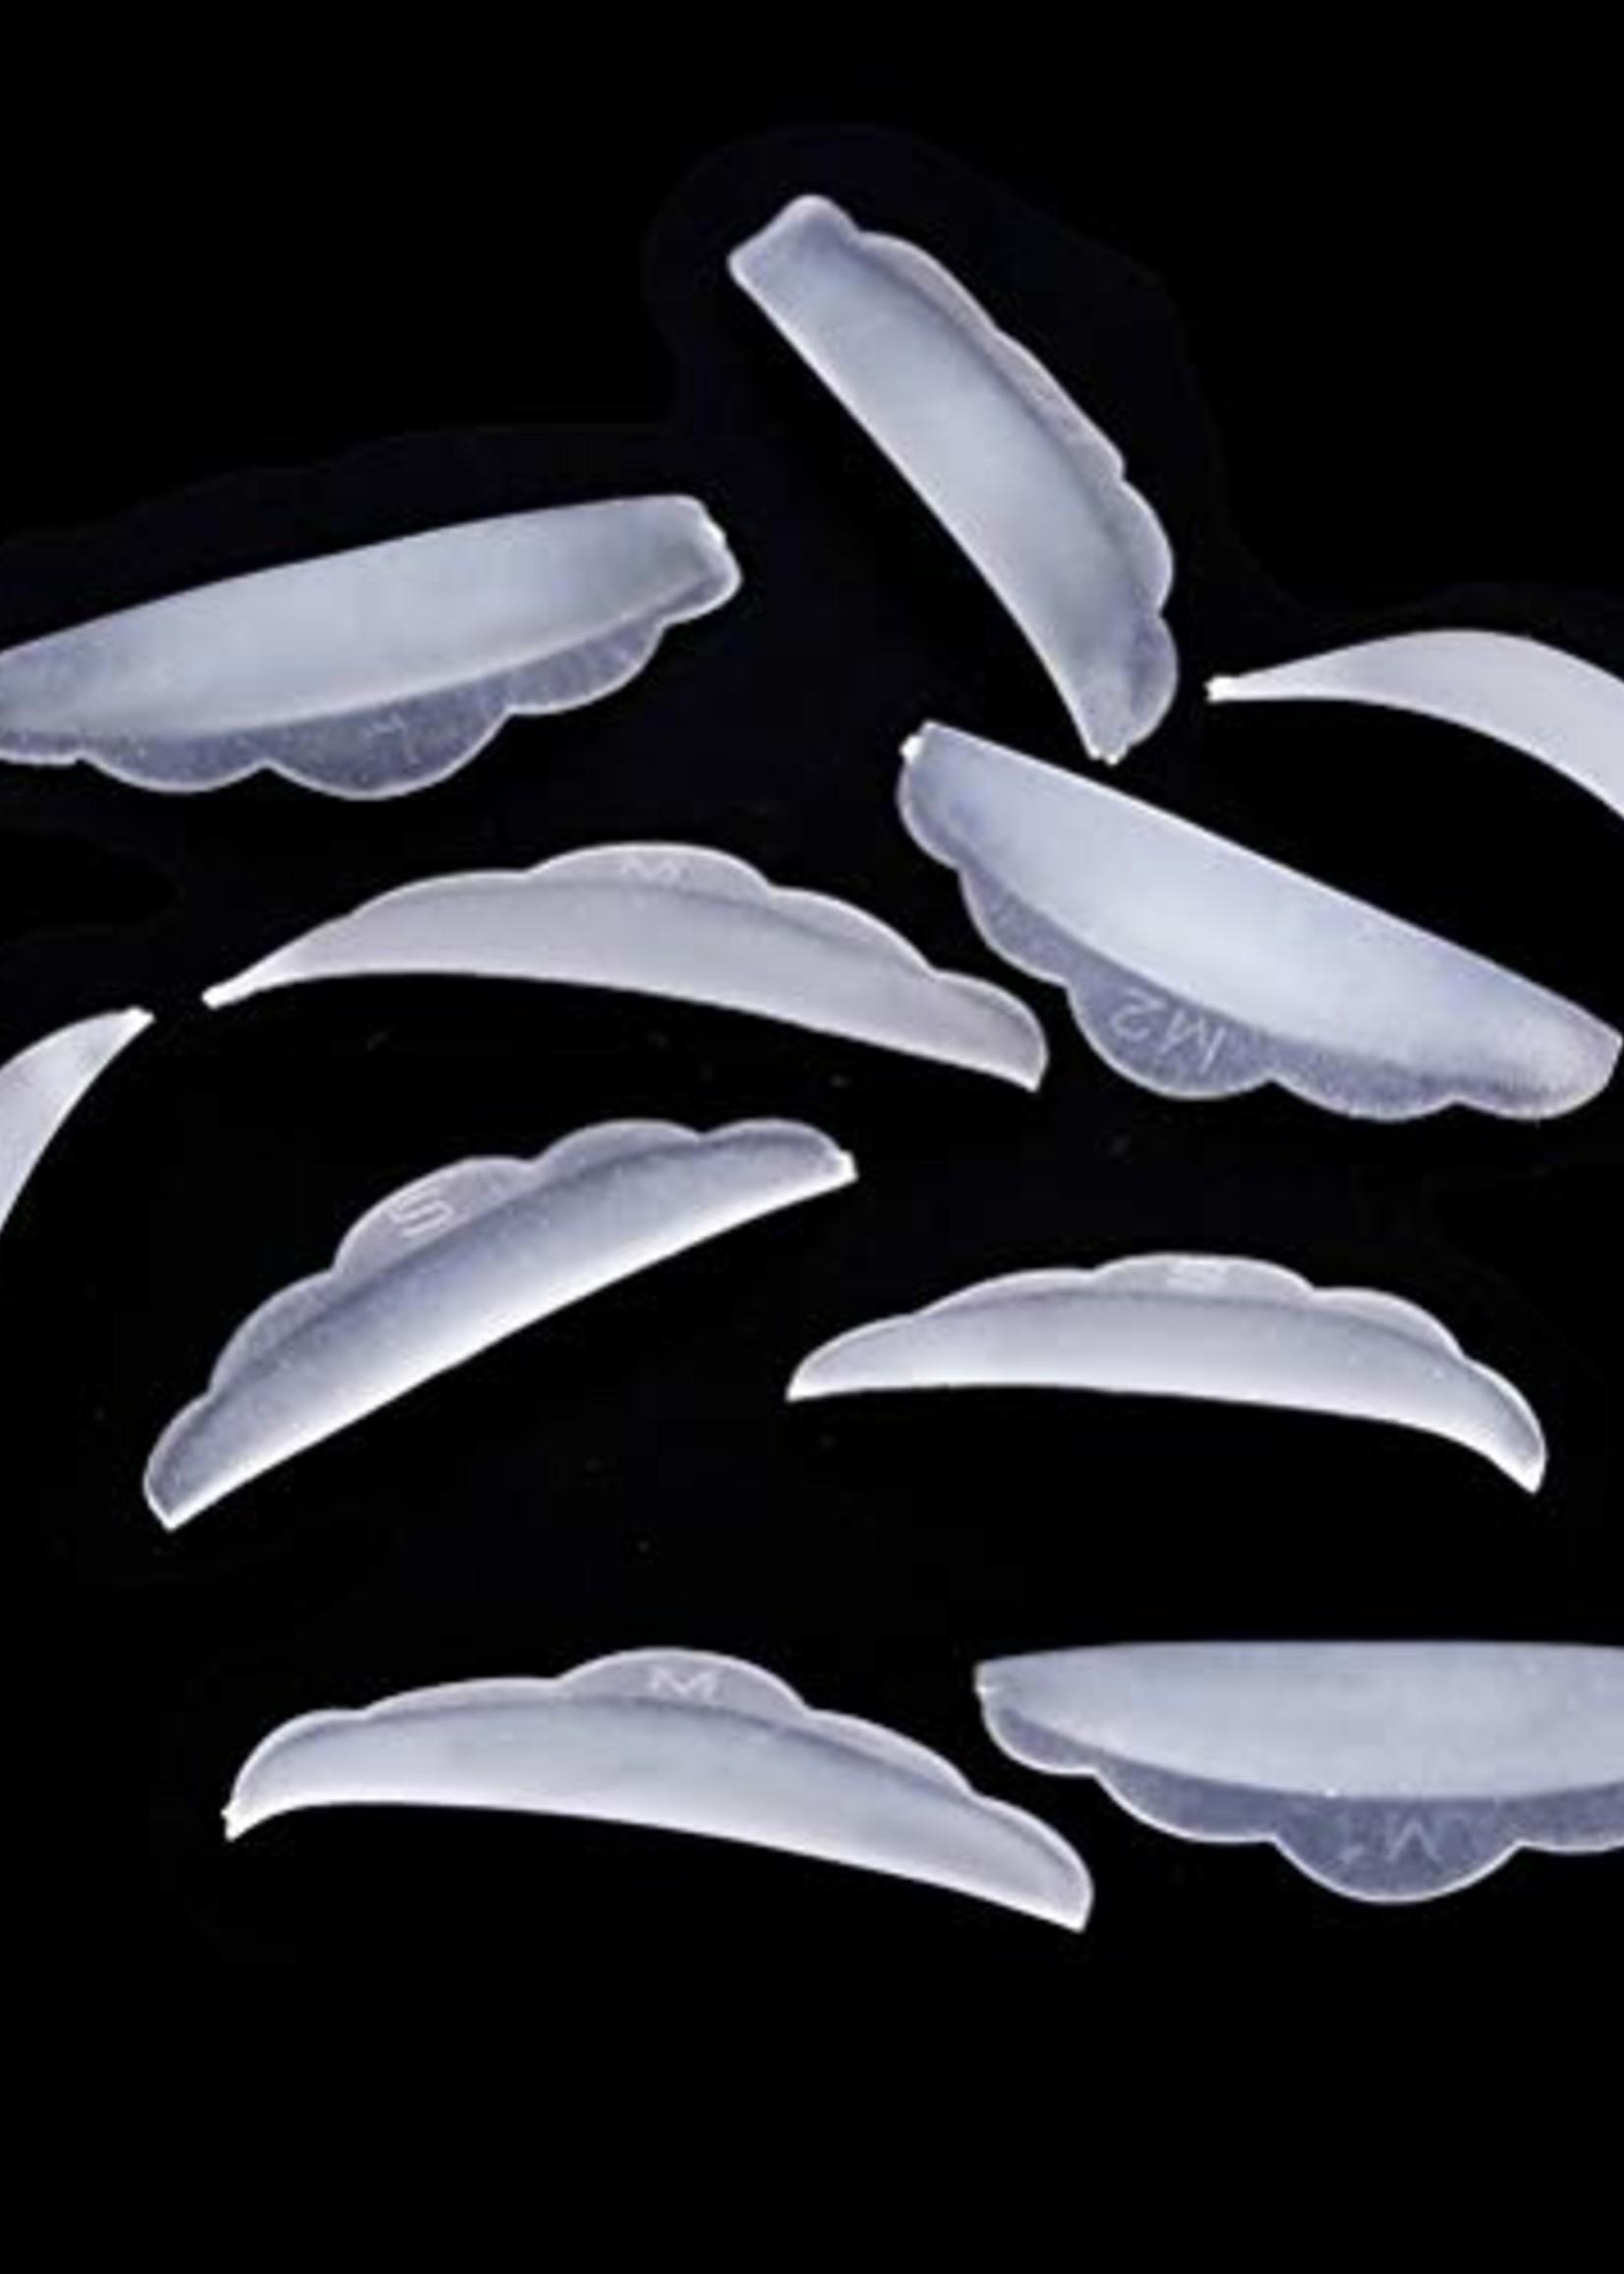 Lash Candies® Silicone Rods Round Shape 5 Pair Sizes S, M, M1, M2, L